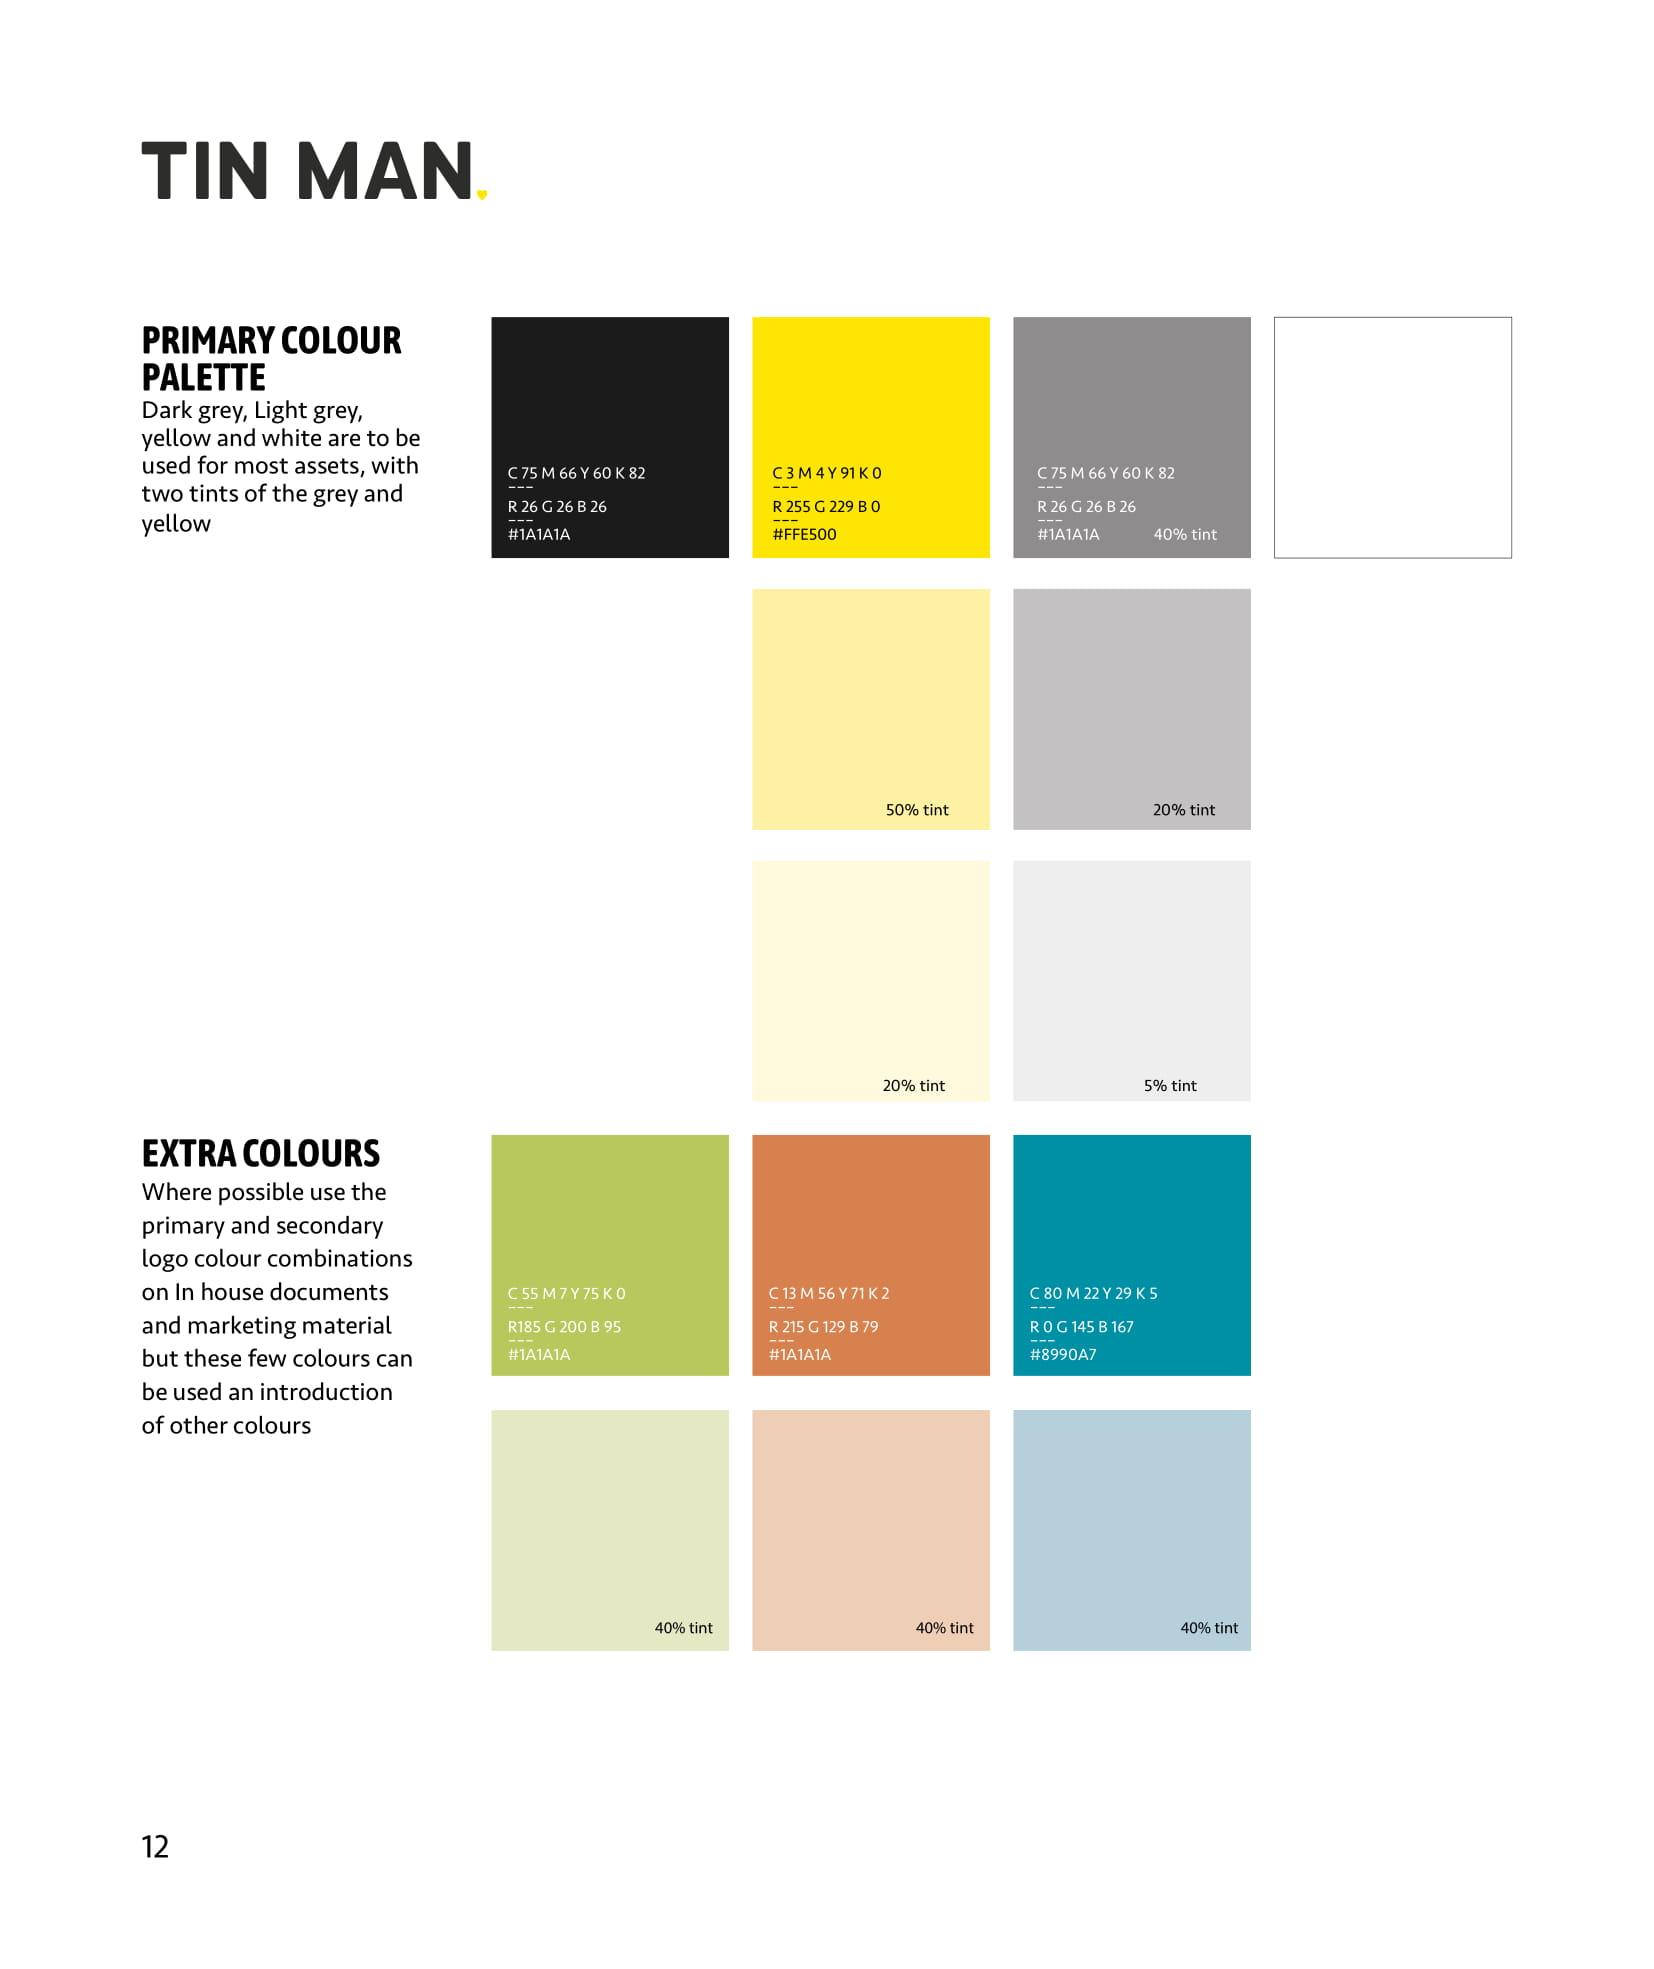 tinman_identityguidelines-12.jpg